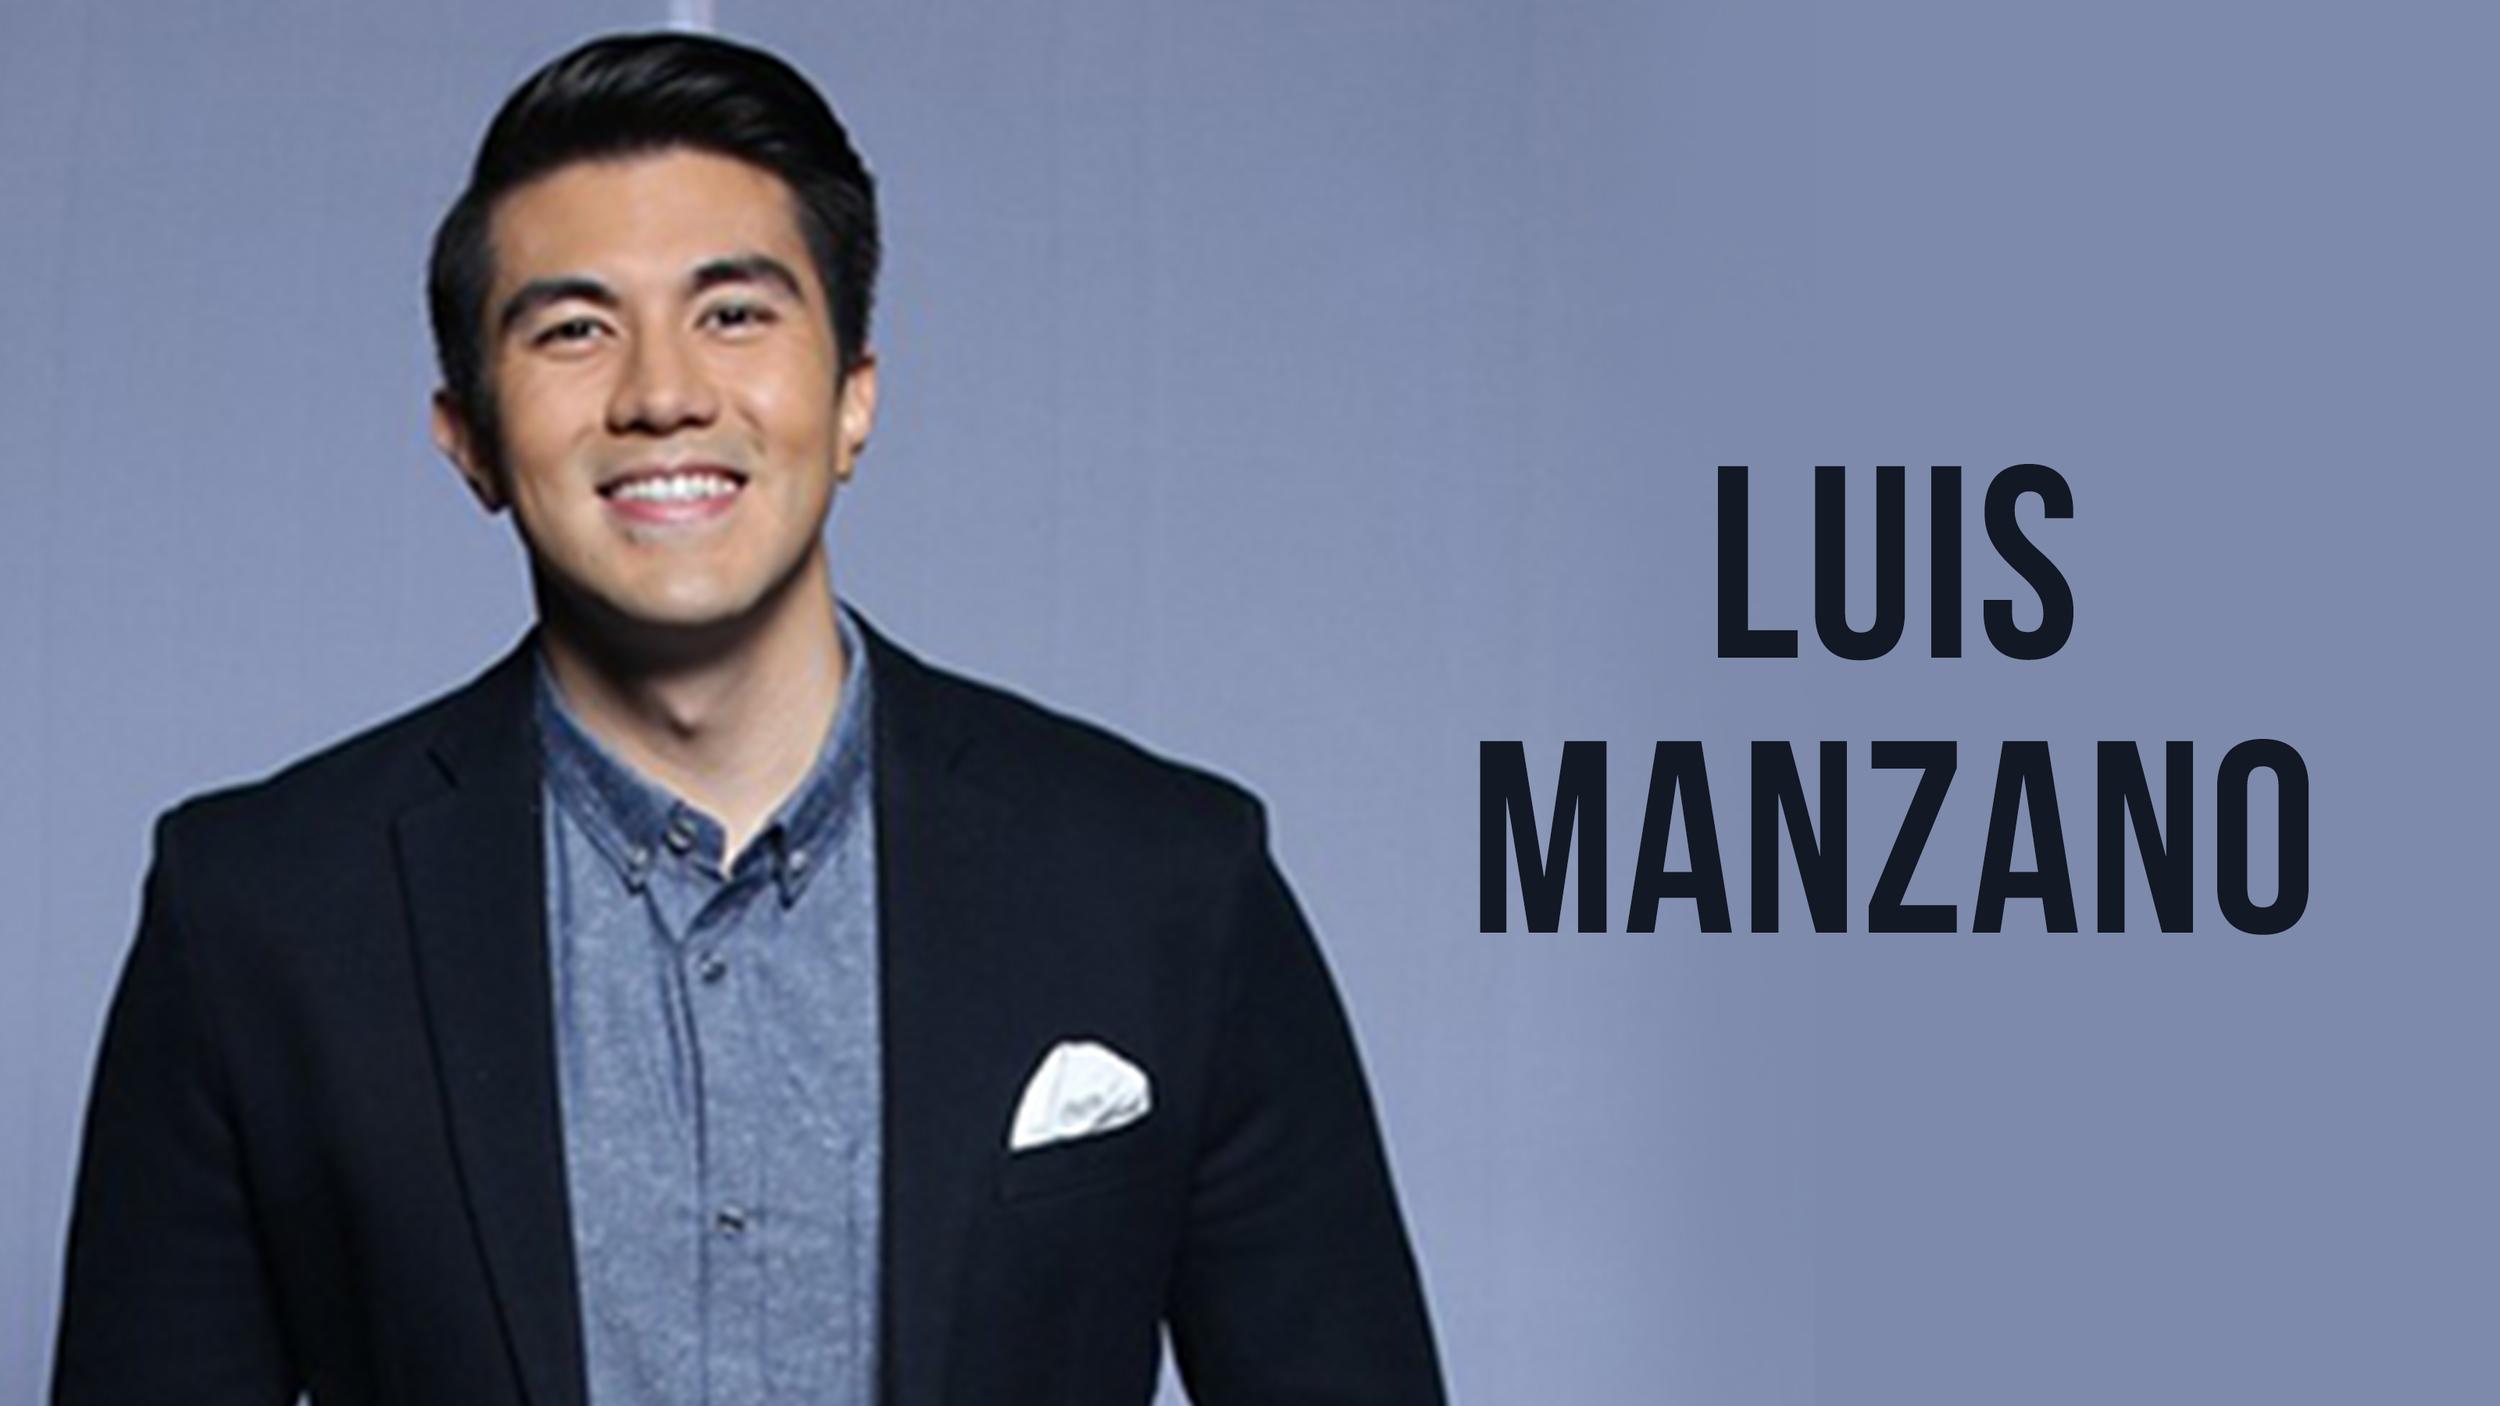 Luis-Manzano.png